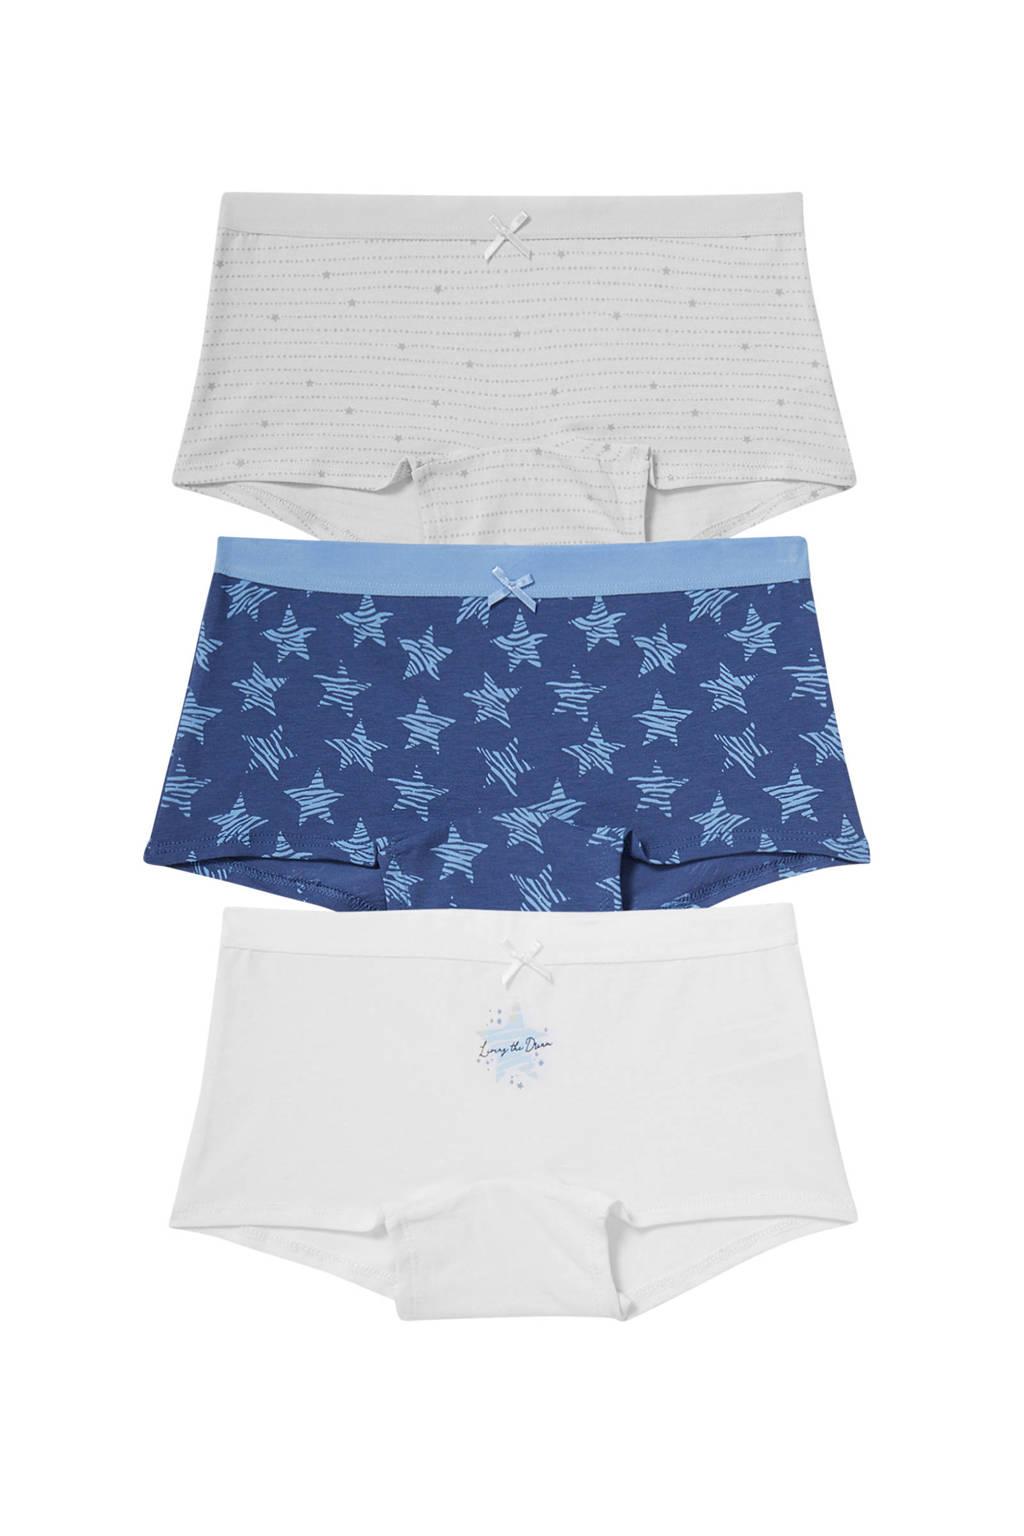 C&A Here & There boxershort - set van 3 blauw/wit, Blauw/wit